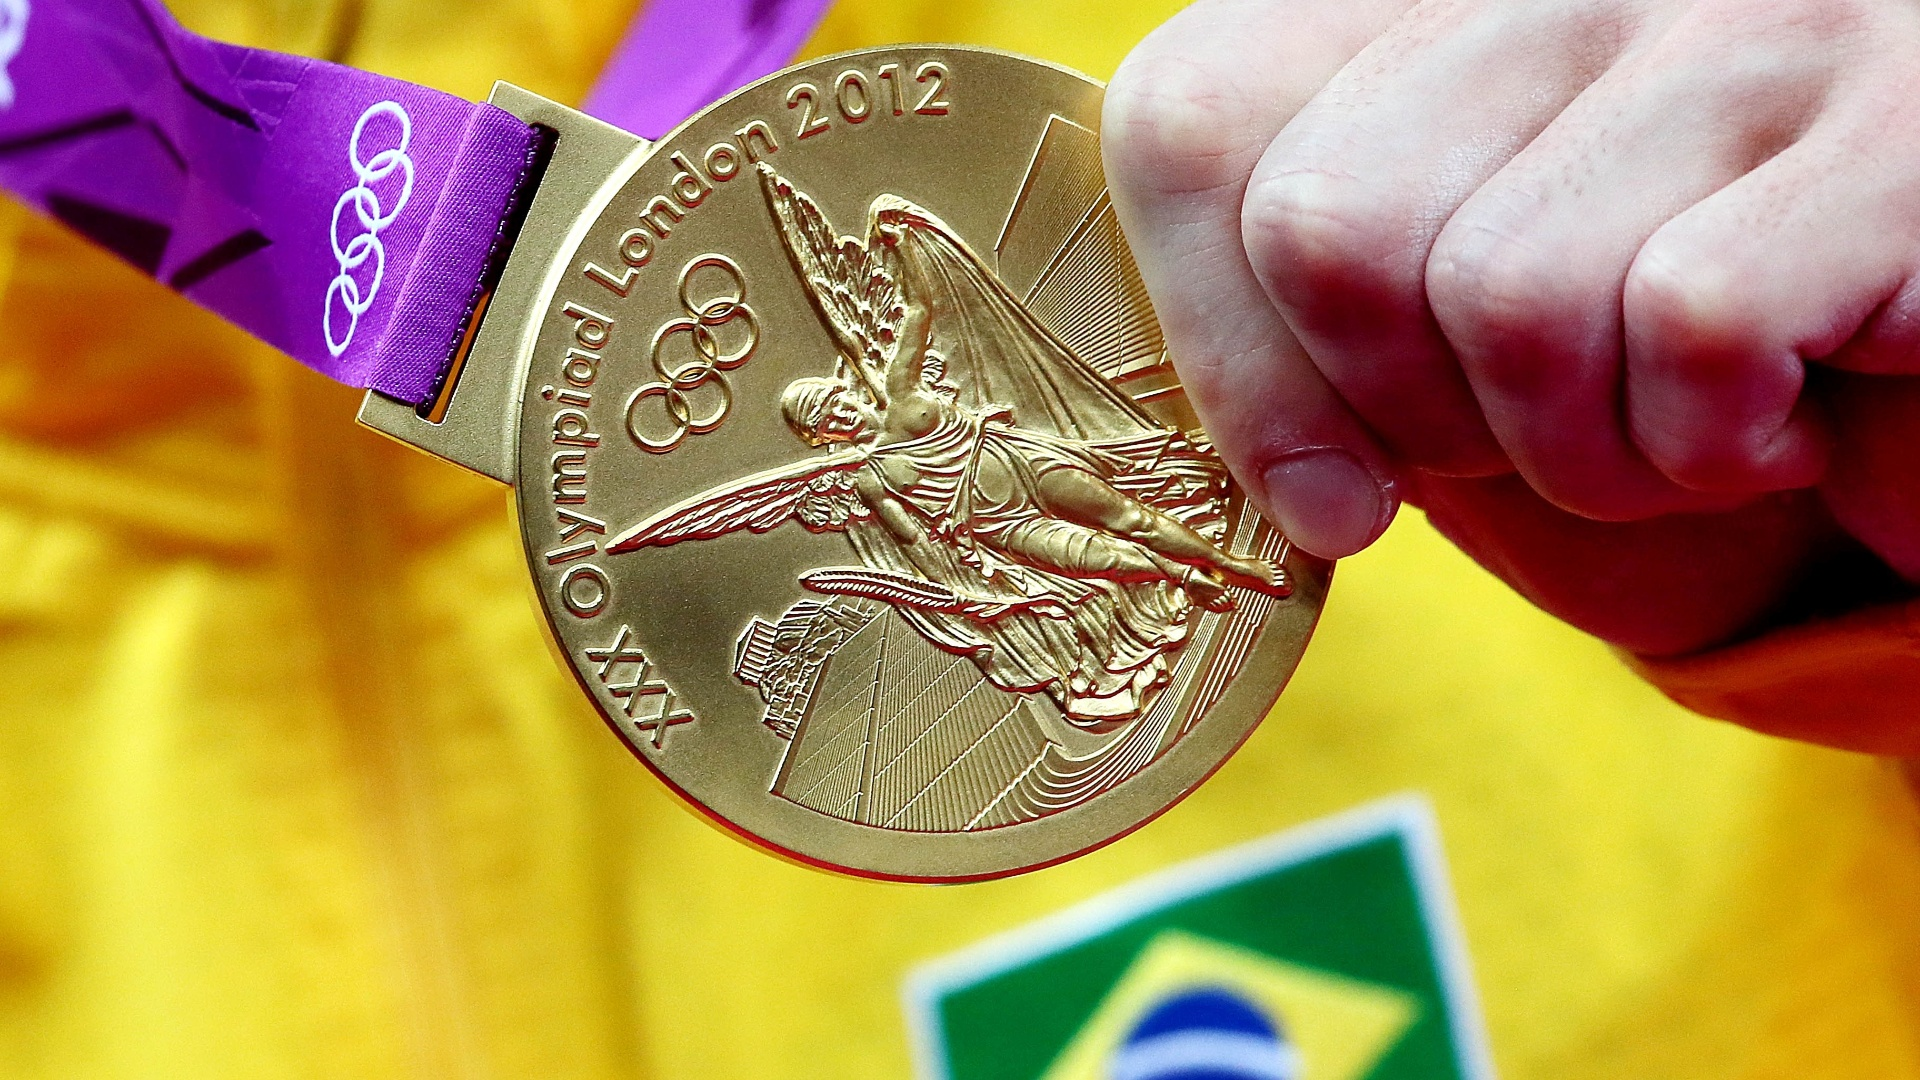 Arthur Zanetti mostra a medalha de ouro, a primeira da história da ginástica brasileira